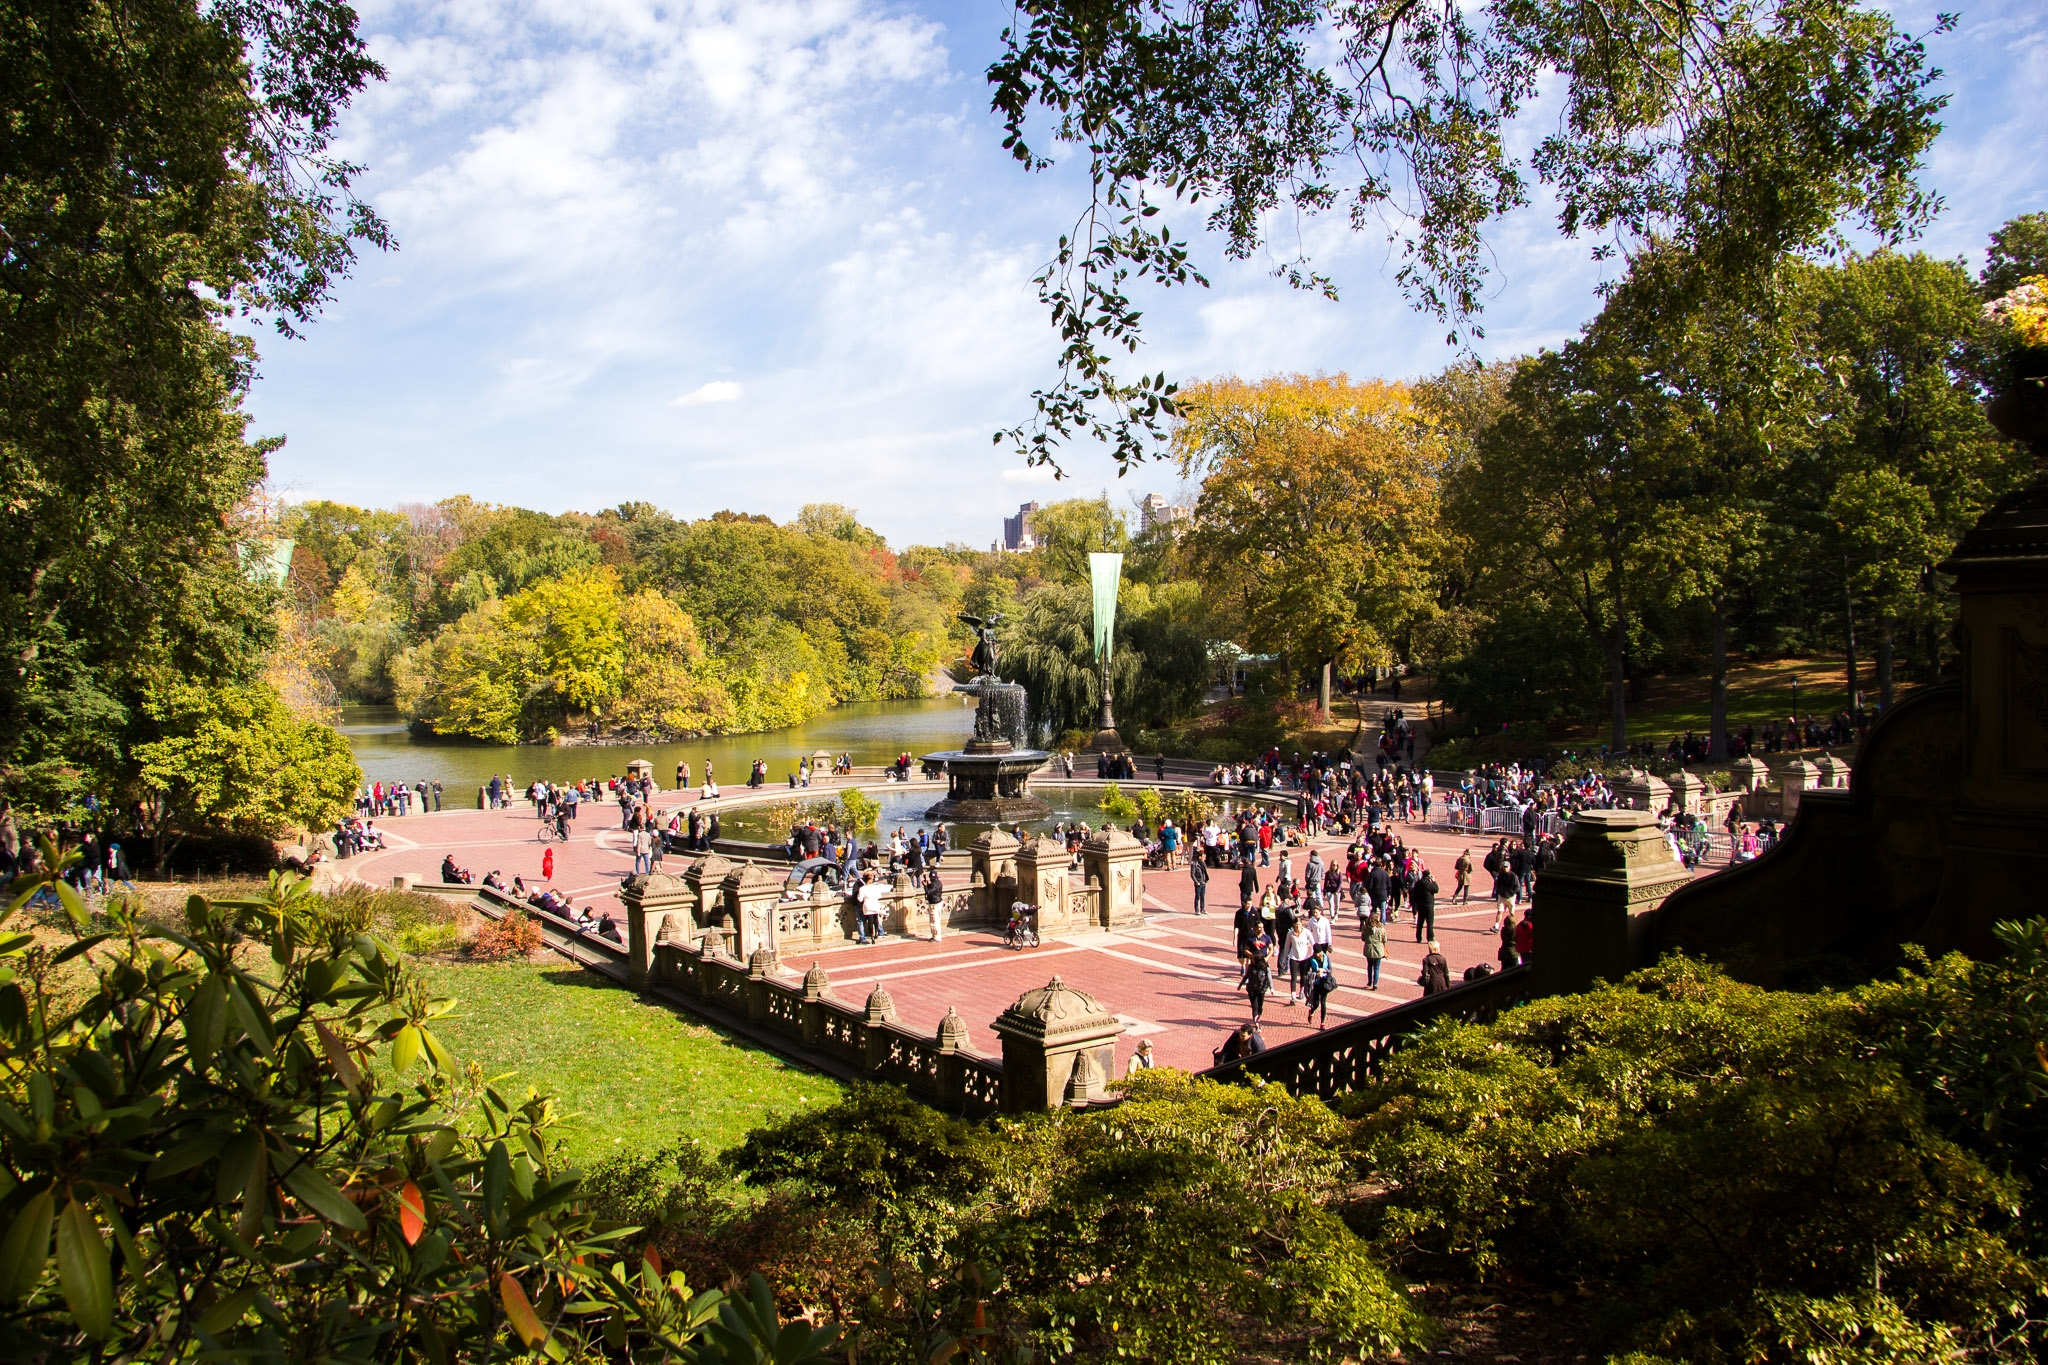 Bethesda-terrace-central-park